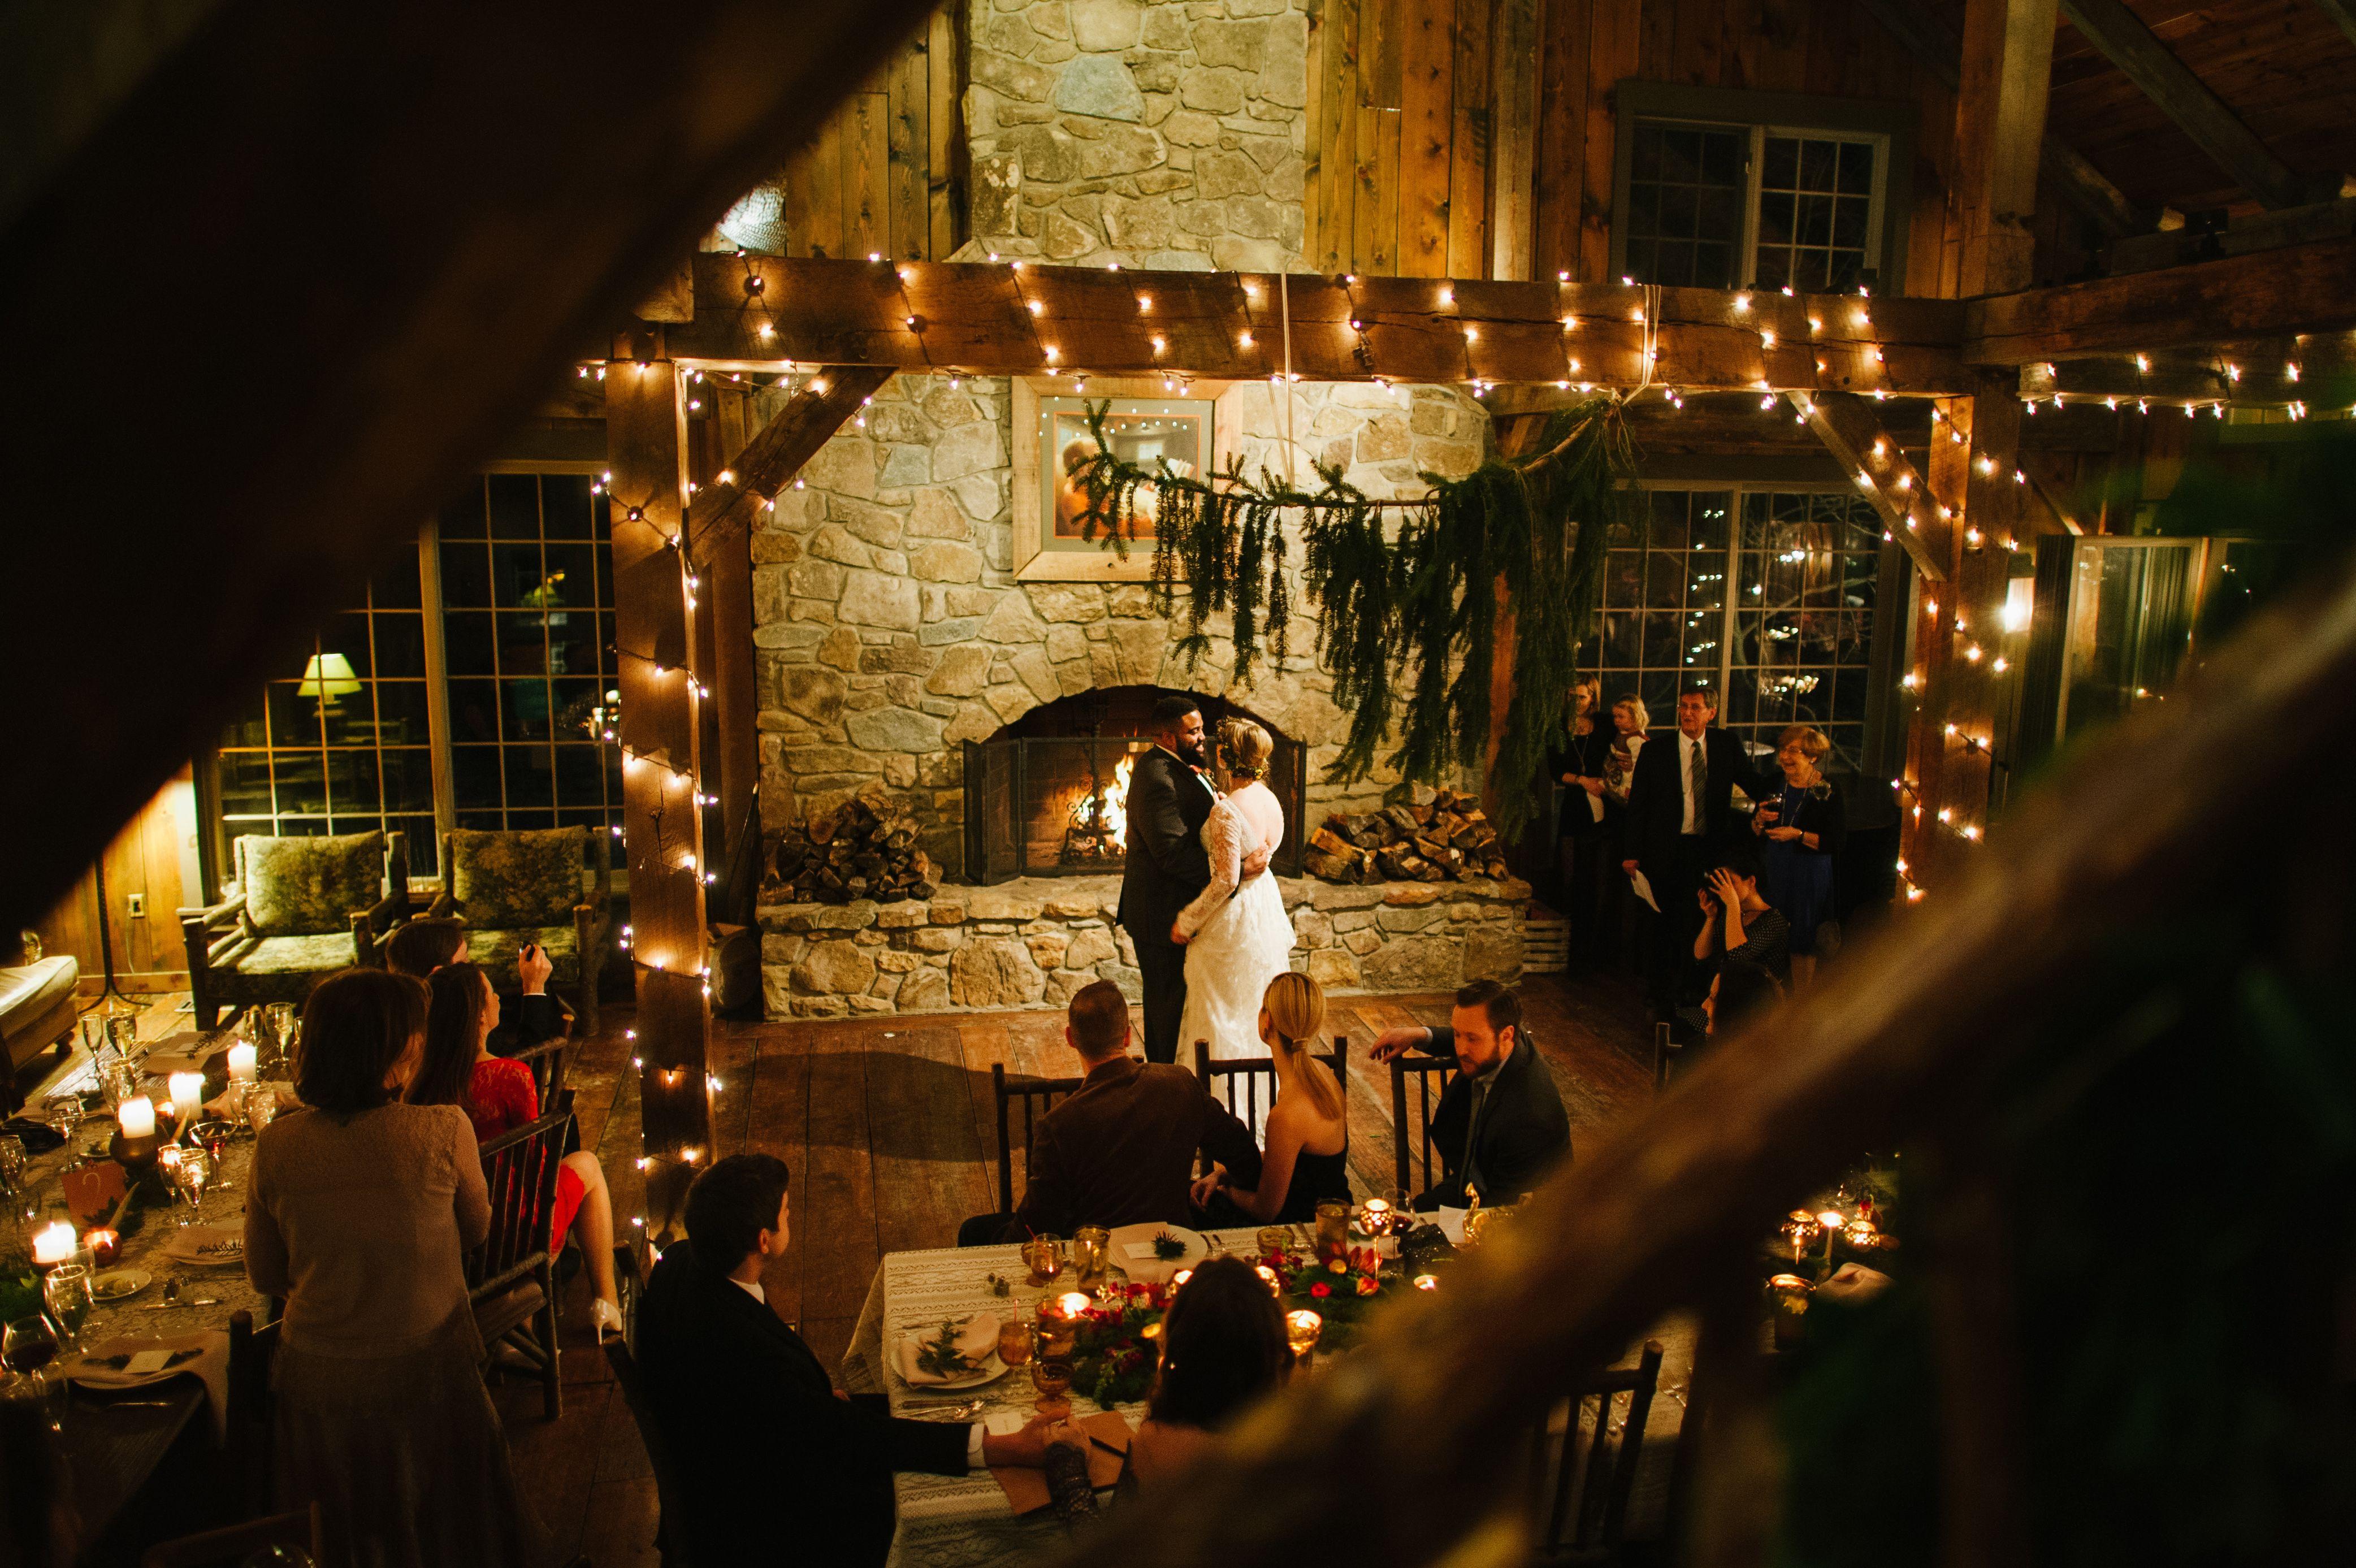 First dance inside the thorpewood lodge weddings pinterest